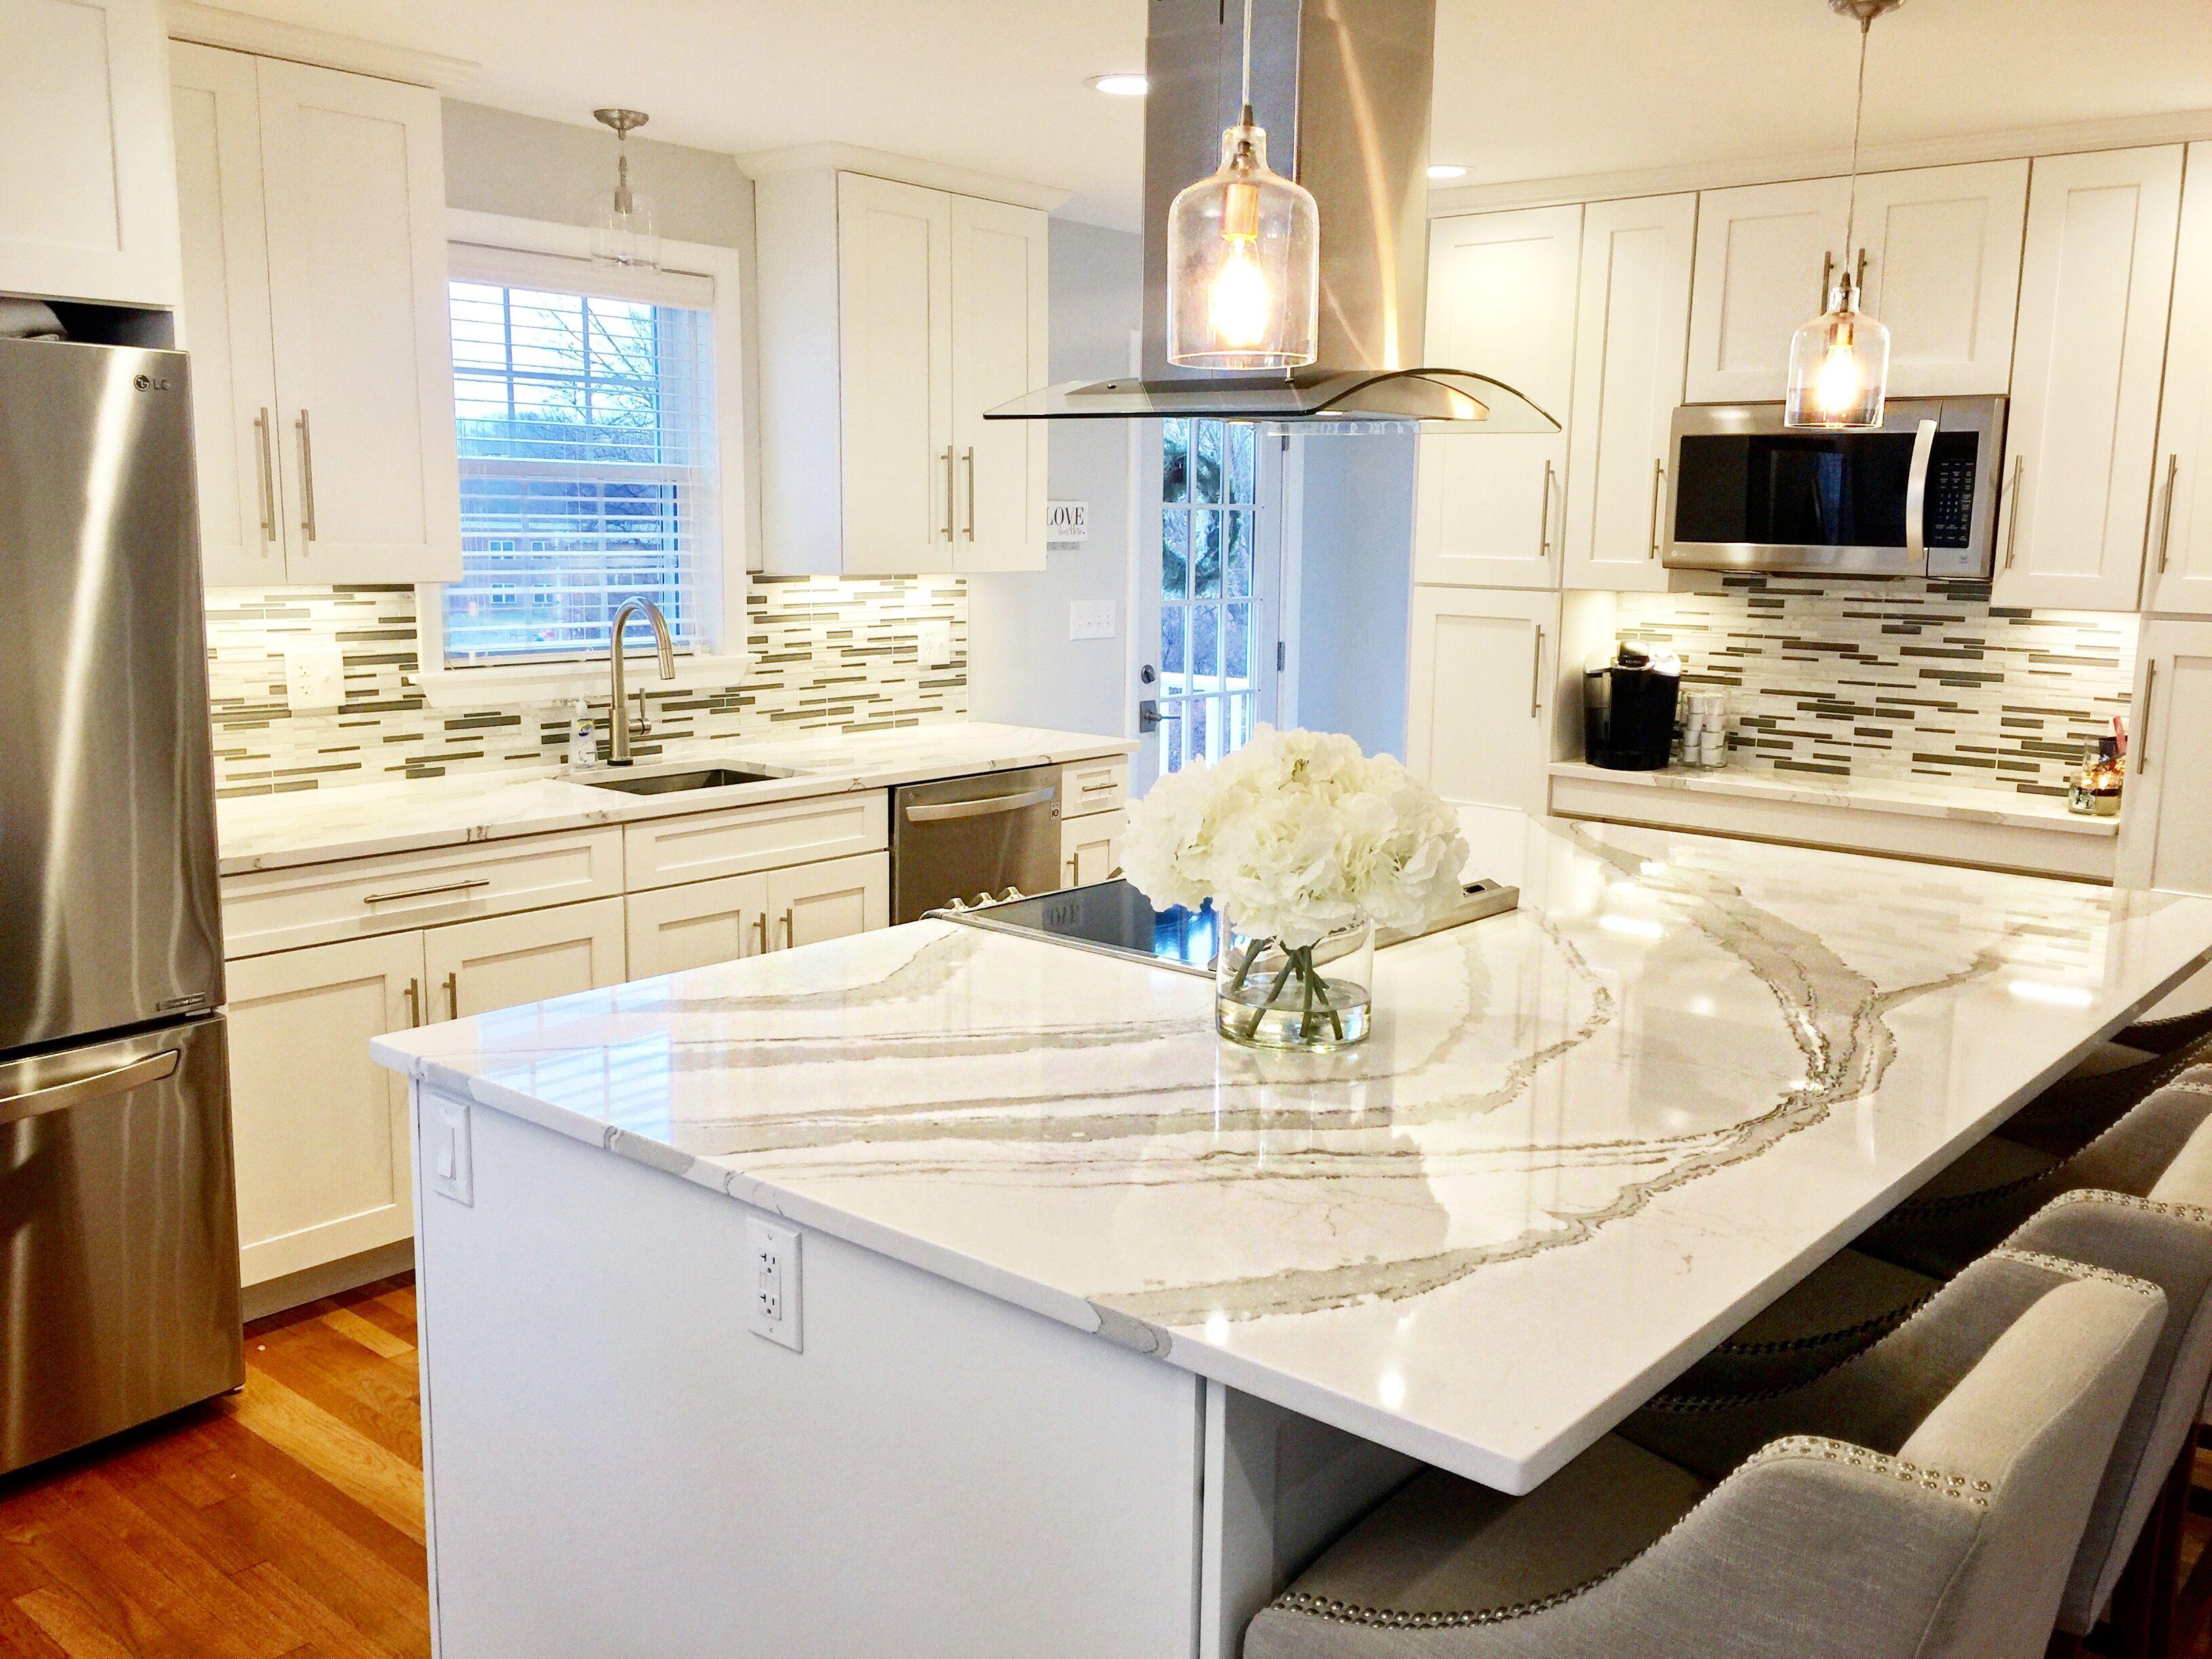 White shaker kitchen cabinets, white and gray Quartz from Cambria ...